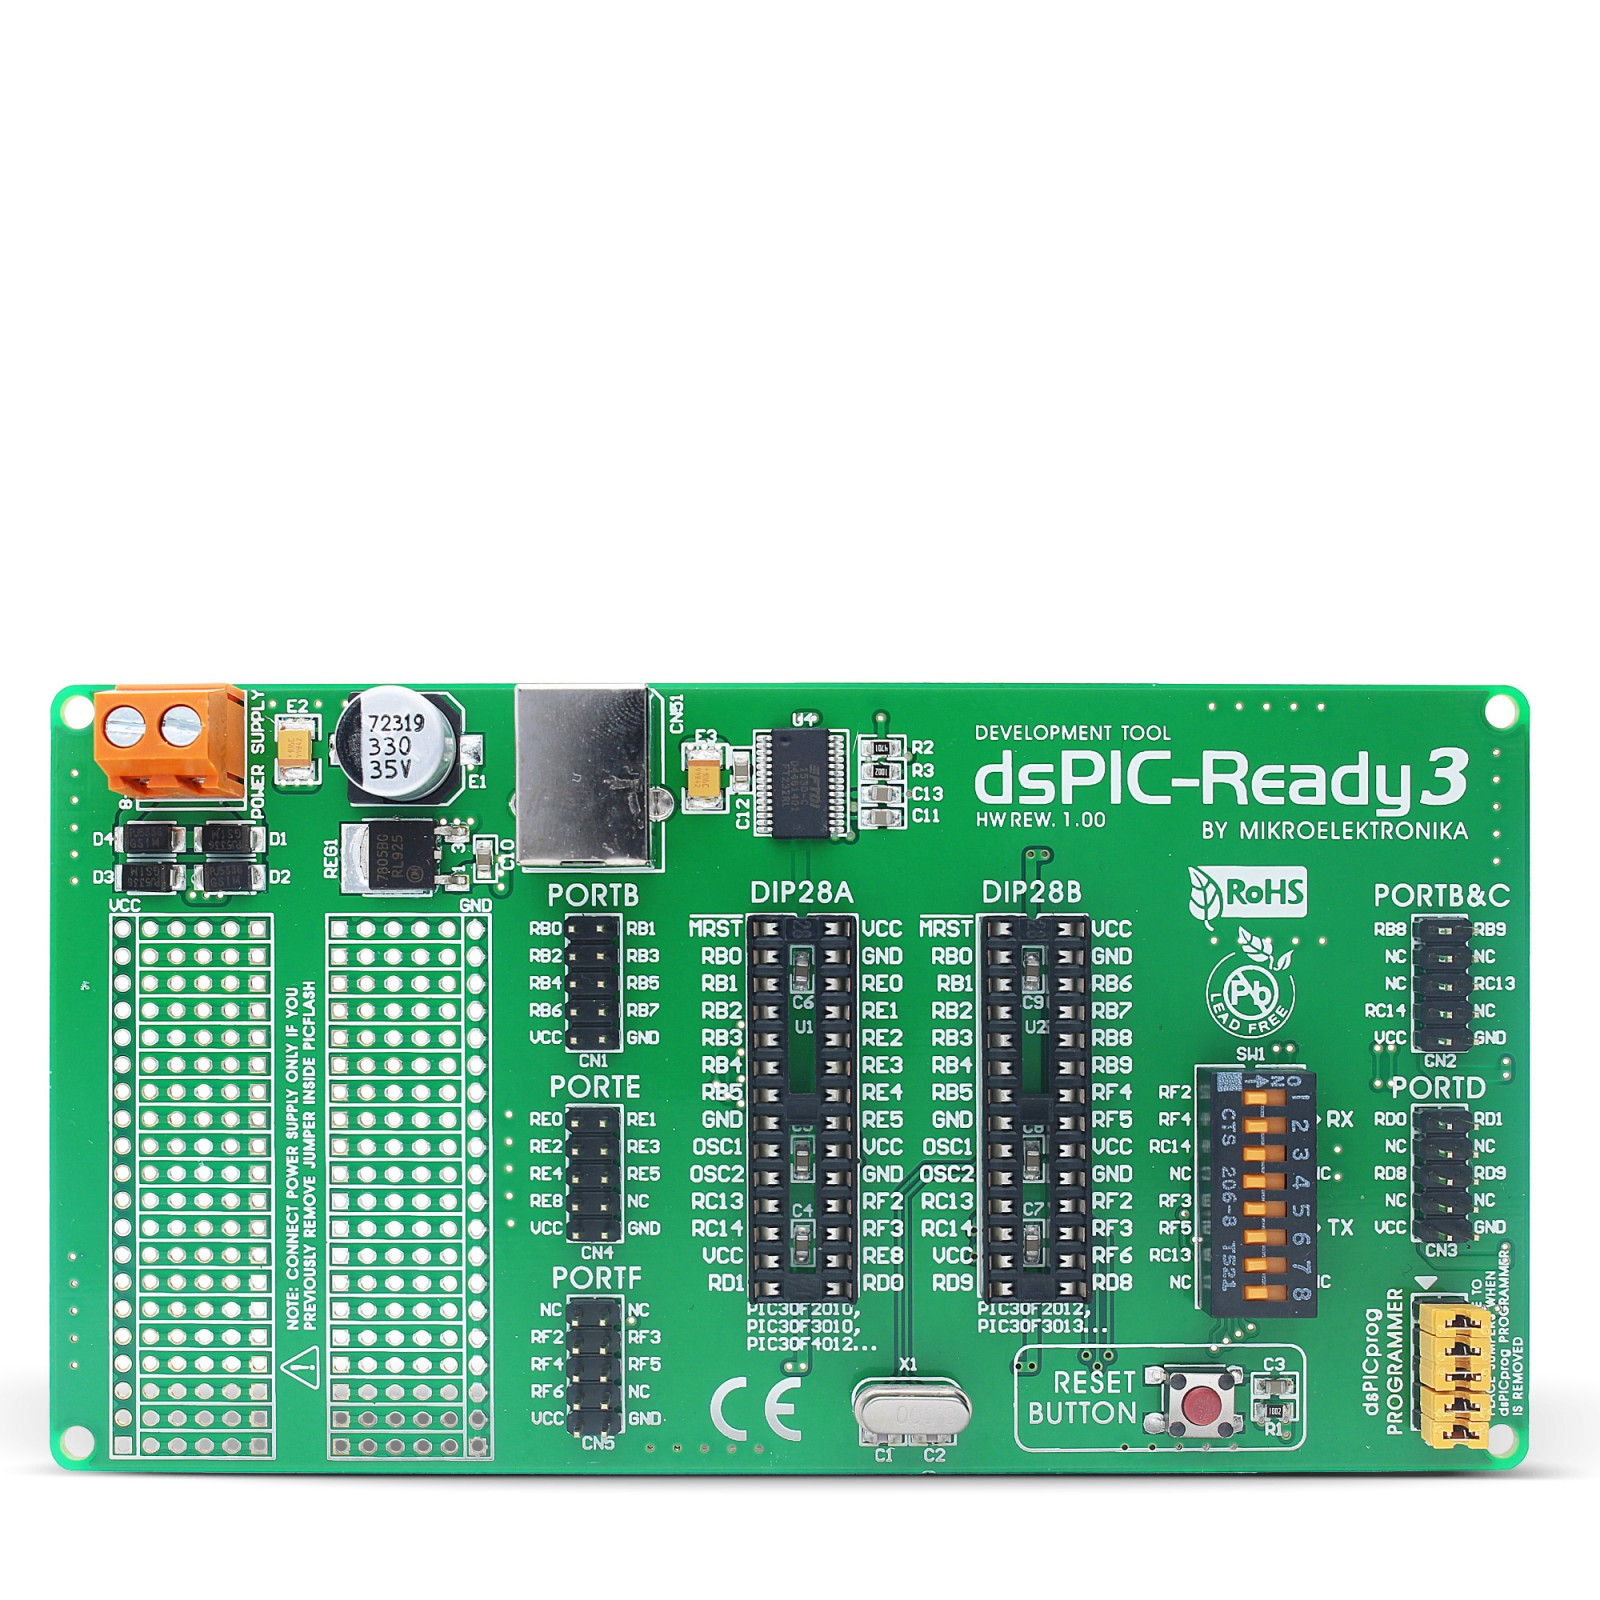 Dspic Ready3 Board 28 Pin Dspic30f2010 Dspic30f3010 Etc The Lr Series Circuit Electronics Mgctlbxnmzp Mgctlbxv5112 Mgctlbxlc Mgctlbxpprestashop